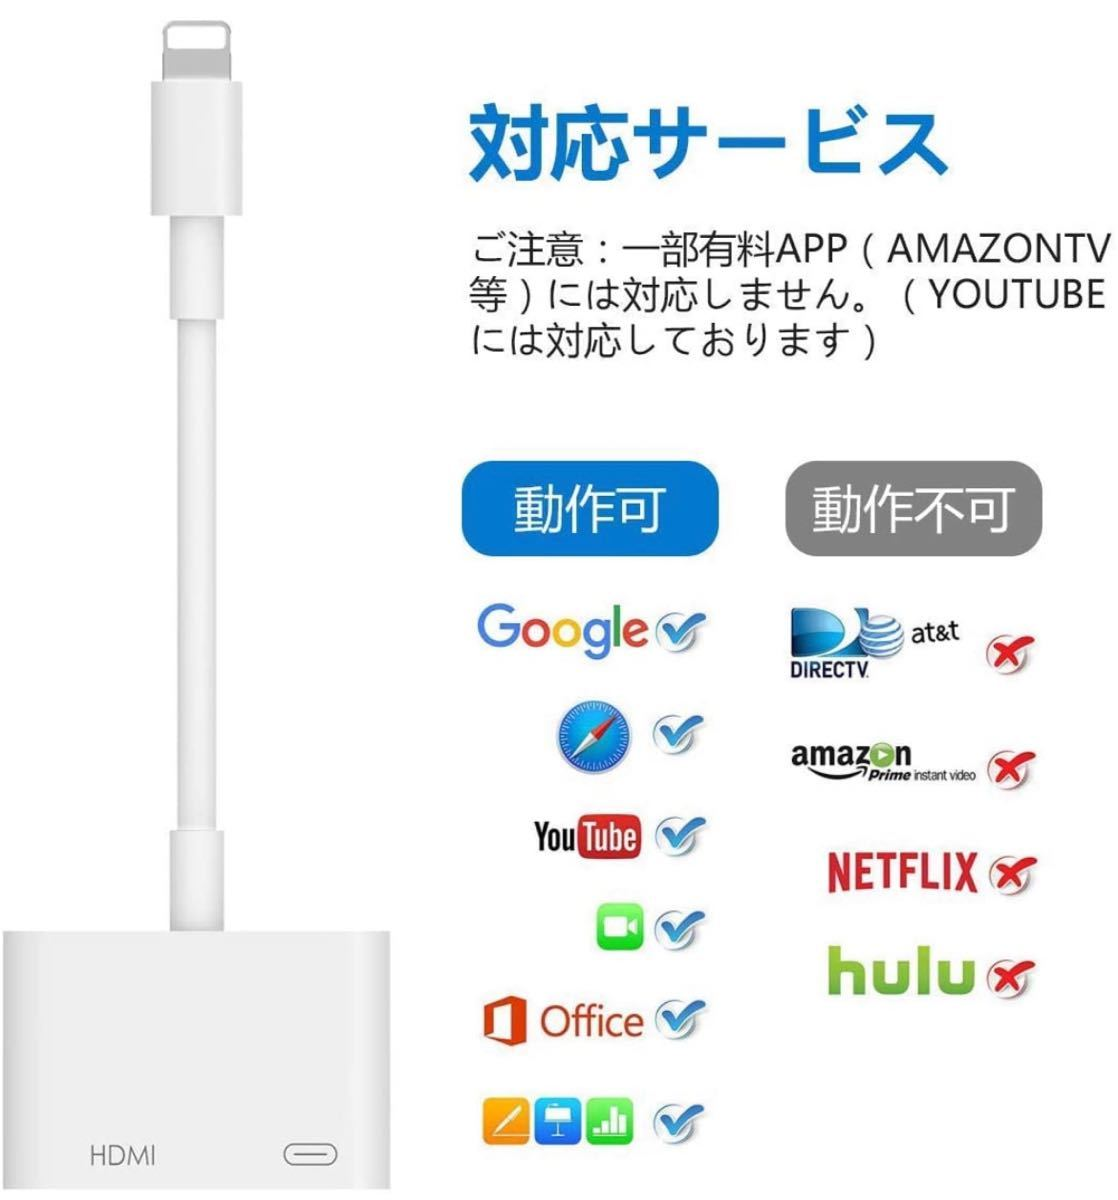 Phone HDMI 変換アダプタ ライトニング 接続ケーブル アダプタ HDMIケーブル